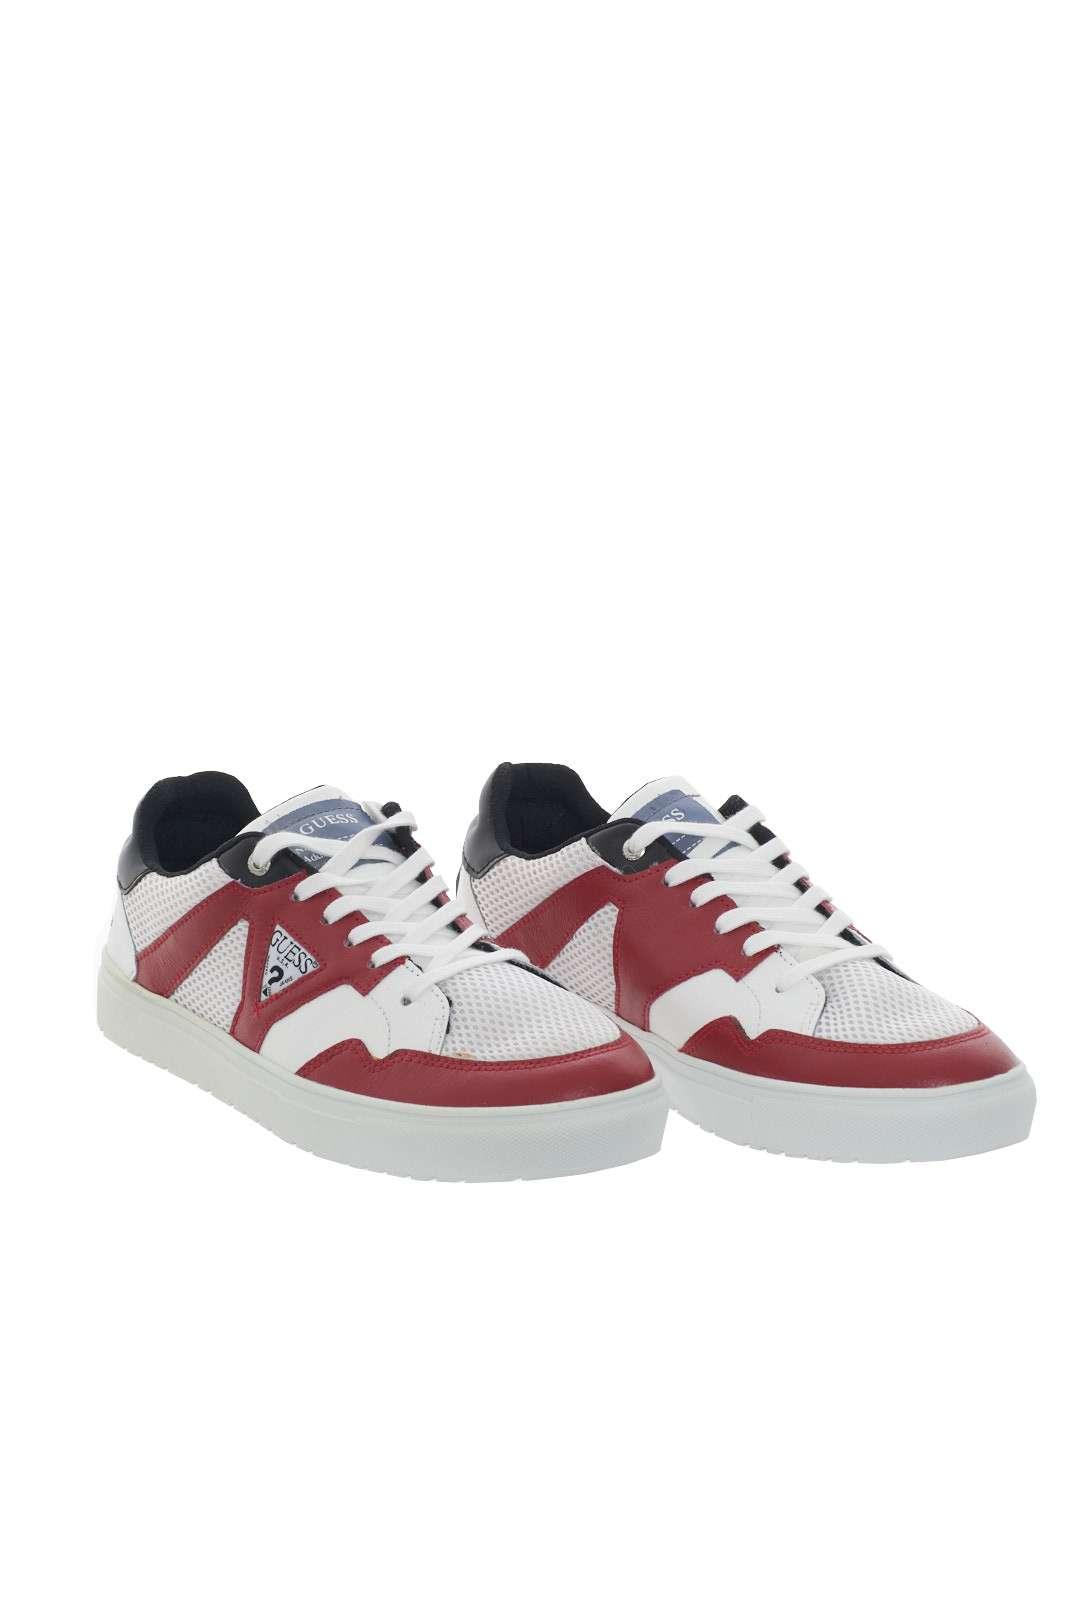 https://www.parmax.com/media/catalog/product/a/i/PE-outlet_parmax-sneaker-uomo-Guess-FM5BRILEA12-C.jpg